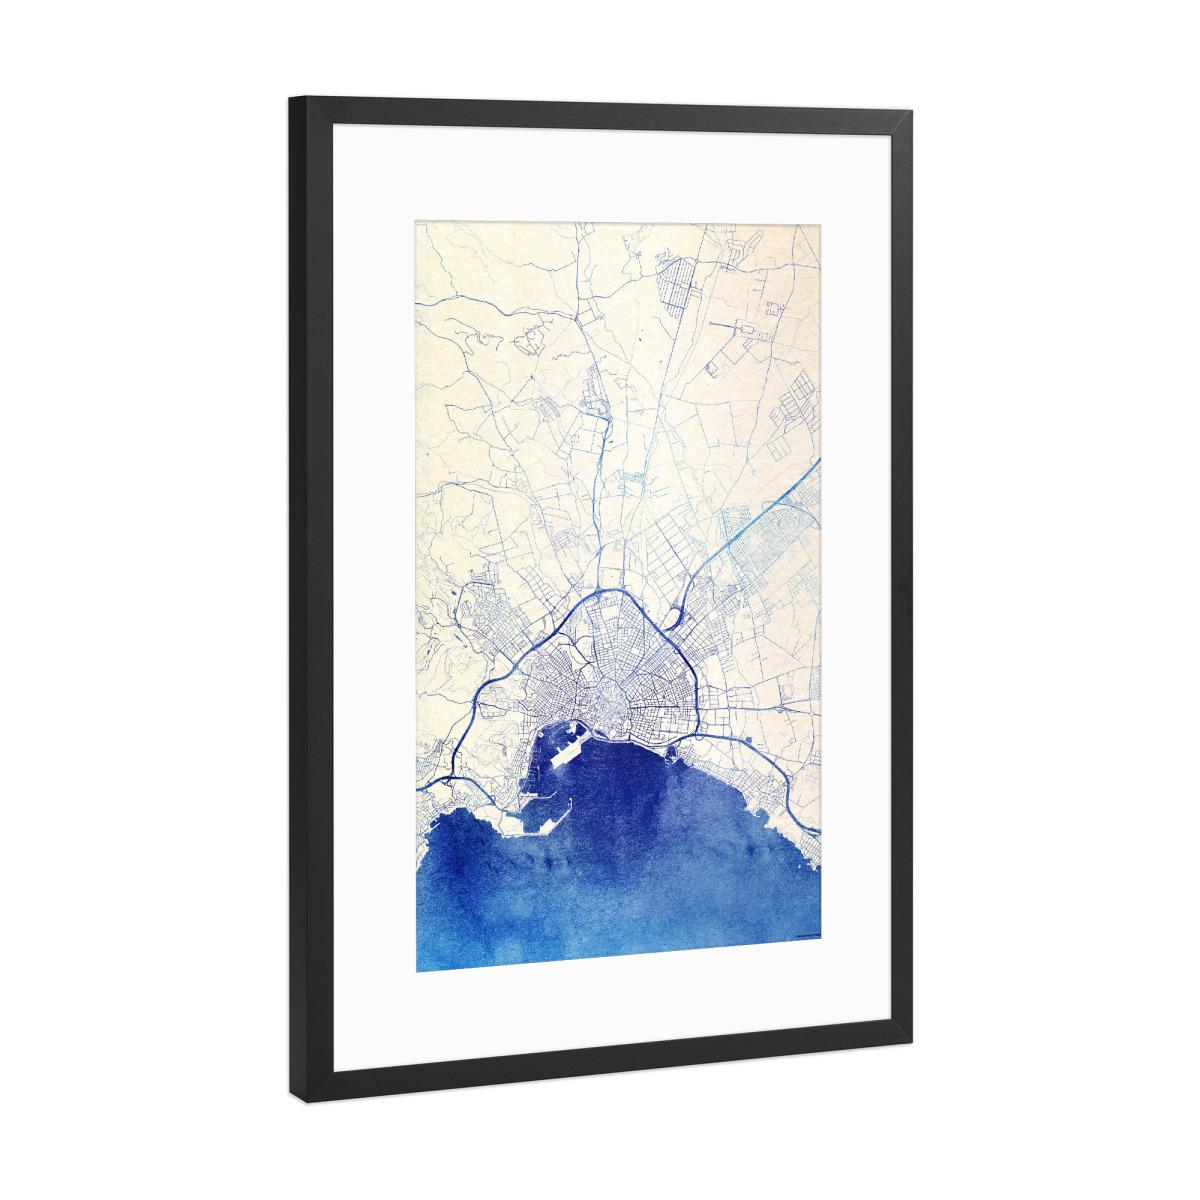 Palma Mallorca Blue Infusion Map I als Gerahmt bei artboxONE kaufen